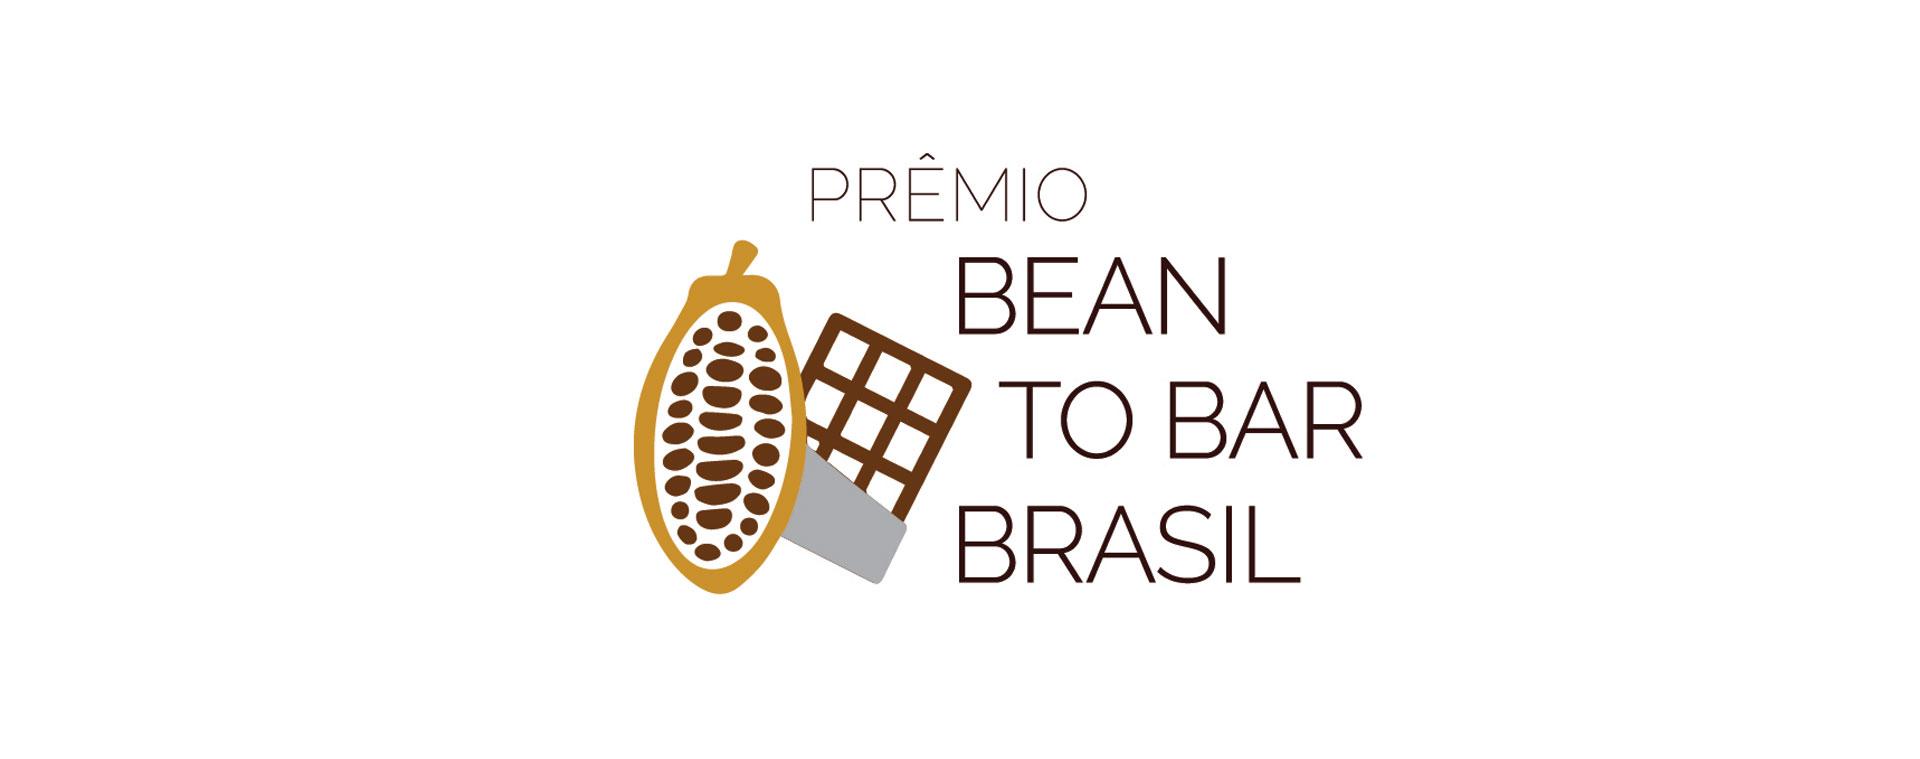 Os chocolates do prêmio bean to bar Brasil